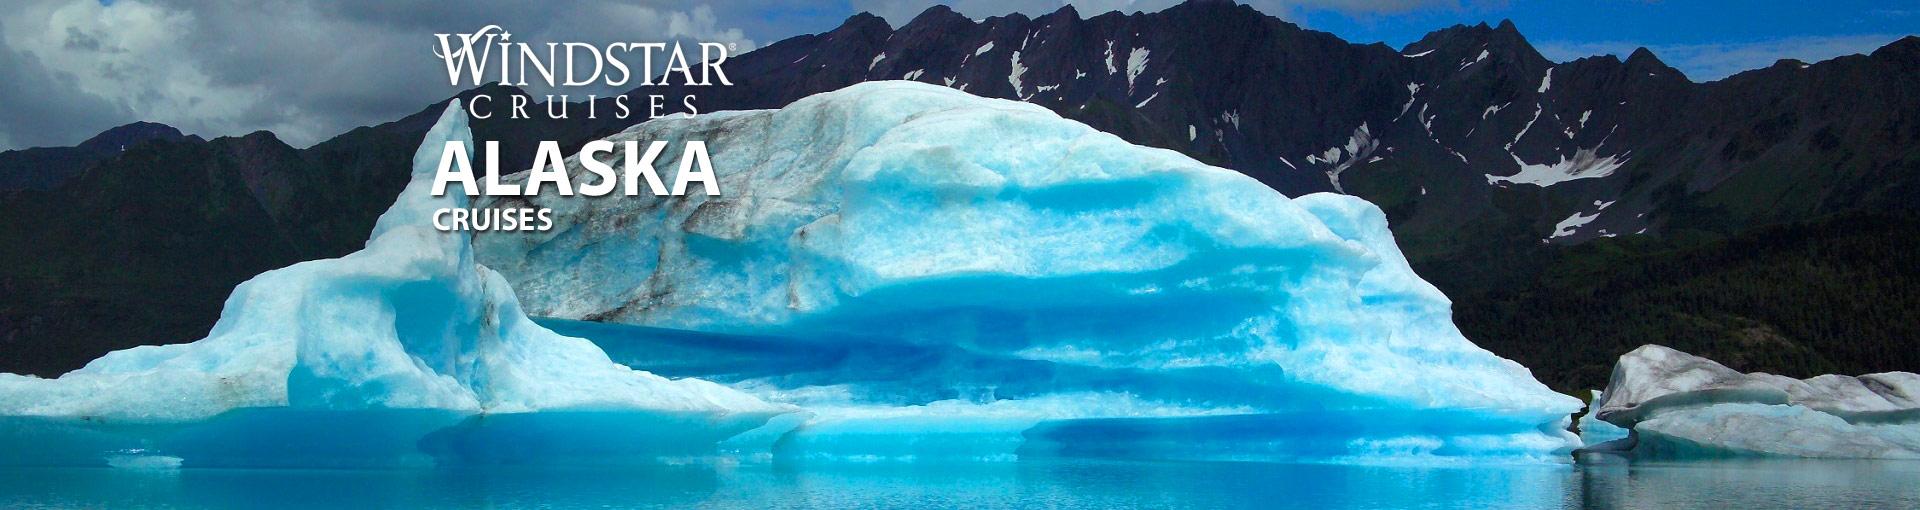 Windstar Cruises to Alaska